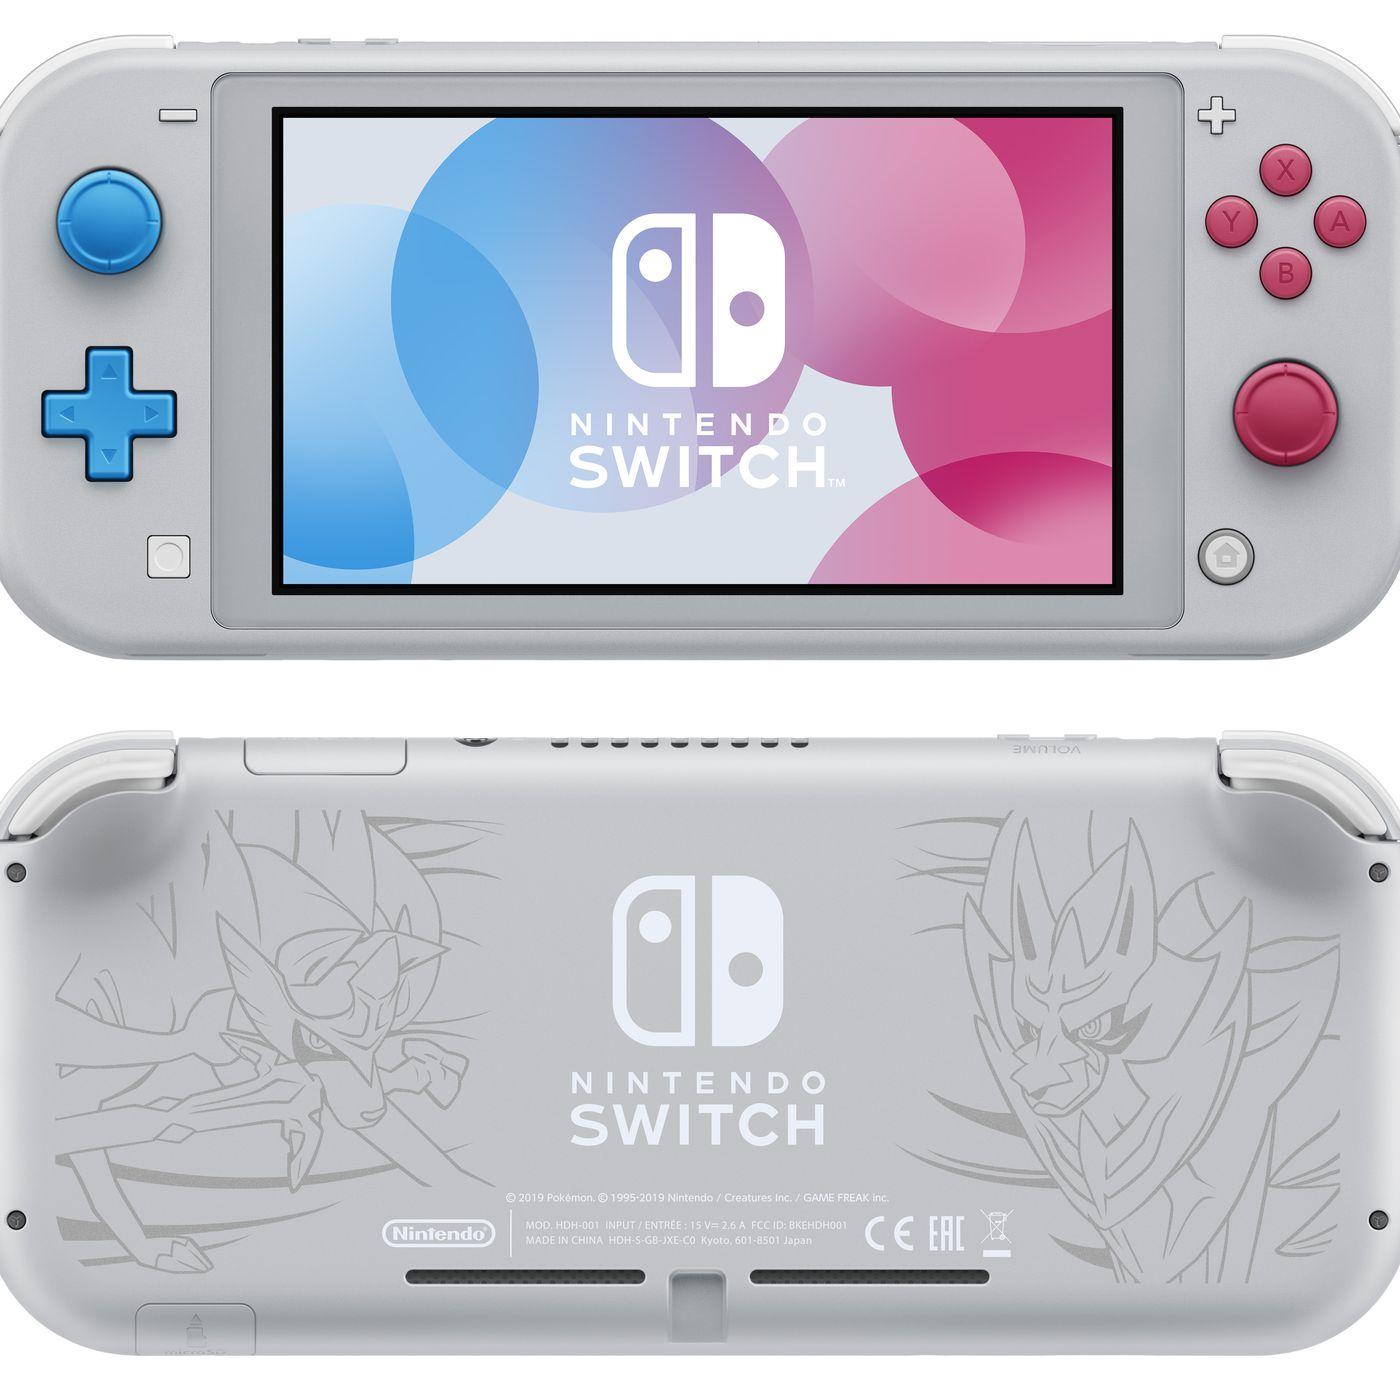 Pokémon Sword and Shield Nintendo Switch Lite special